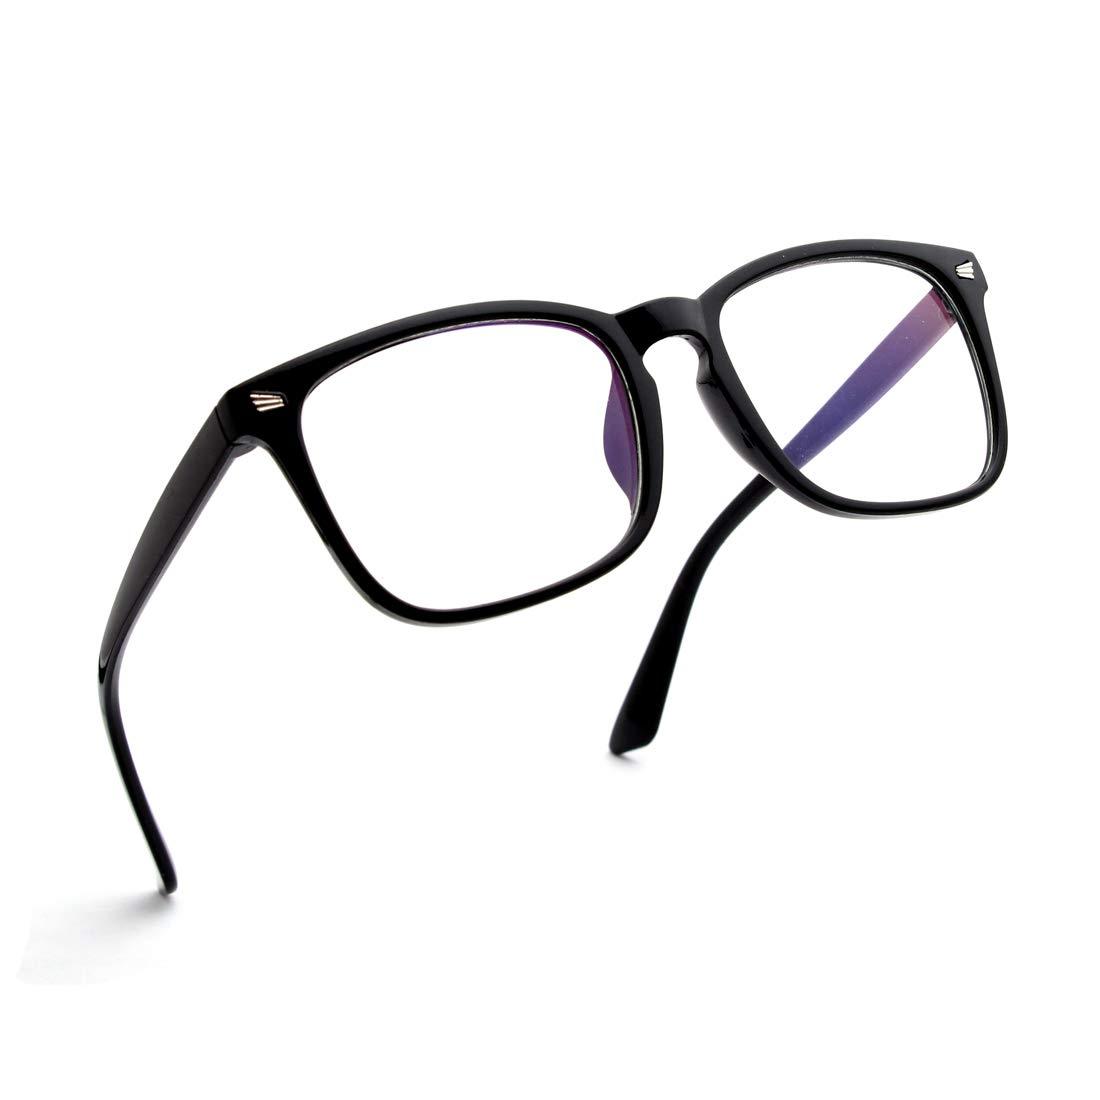 d9a84ab619 Amazon.com  SIPU Unisex Stylish Square Non-prescription Eyeglasses Glasses  Clear Lens Eyewear Frame …  Clothing